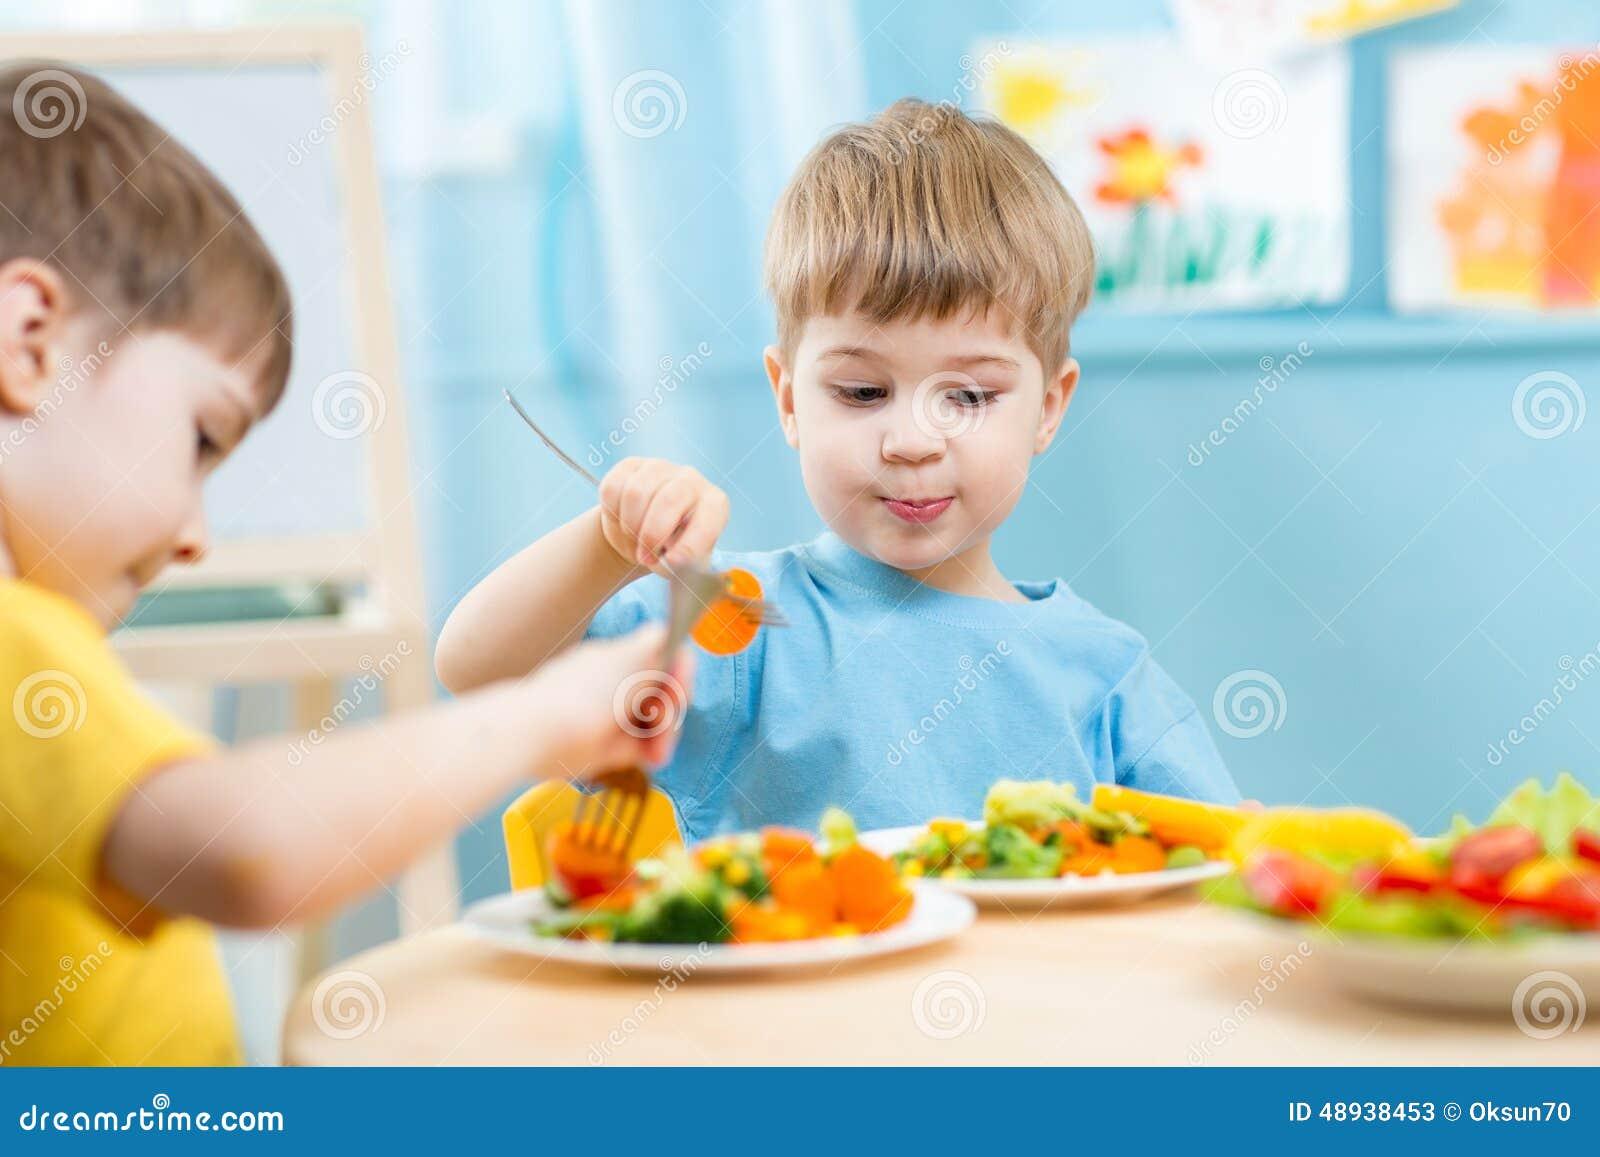 kinder die im kindergarten essen stockbild bild von familie hungrig 48938453. Black Bedroom Furniture Sets. Home Design Ideas